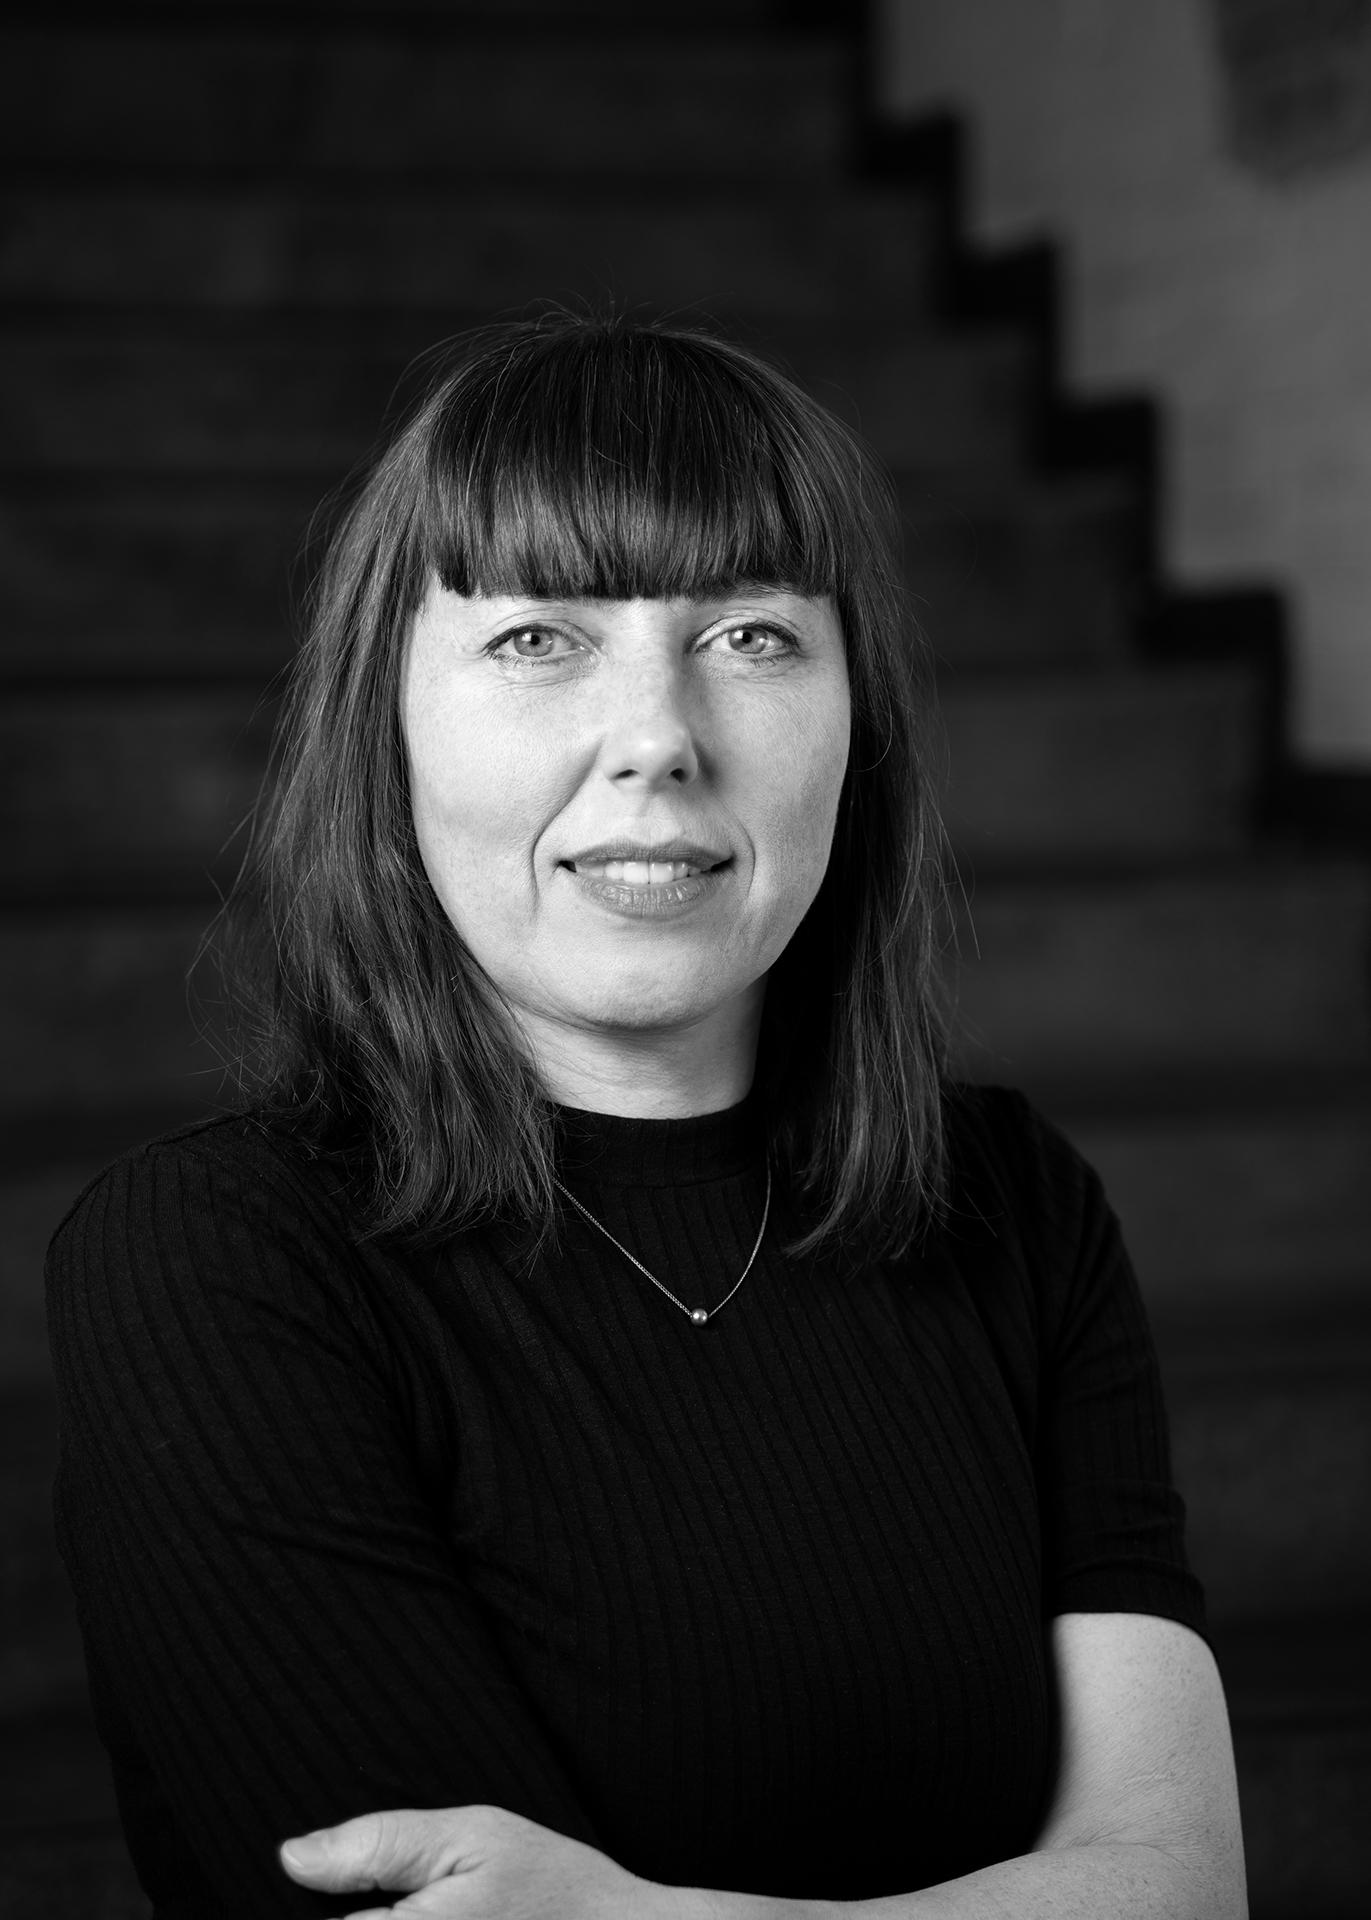 Prof. Dr. Margit Kling - Market Strategy, Brand Positioning & Consumer Psychology